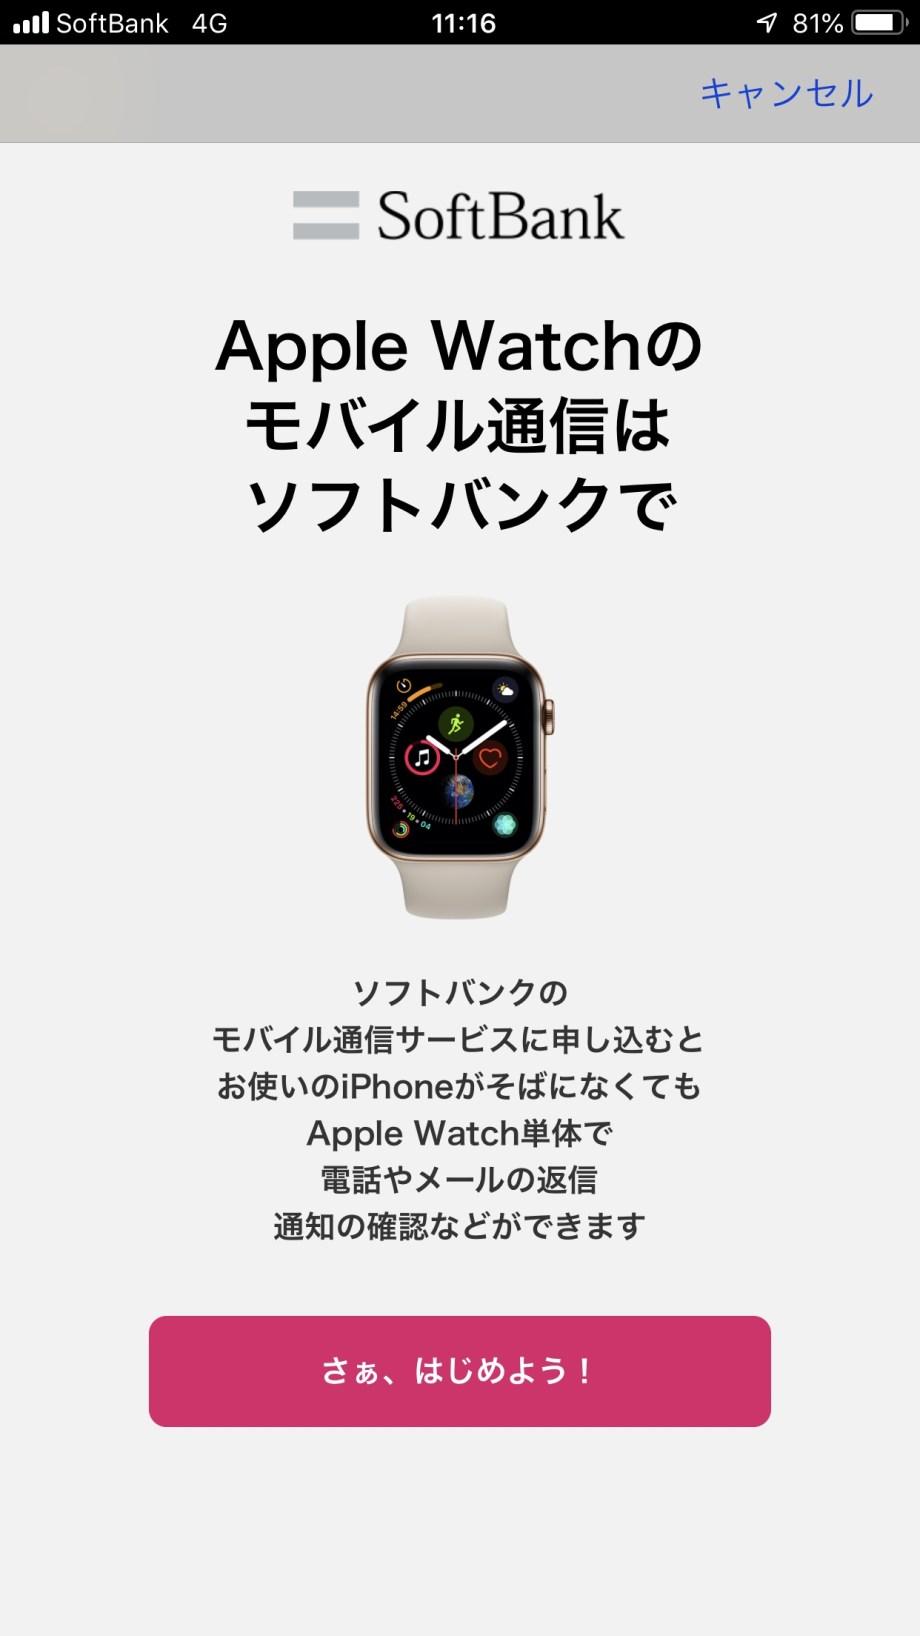 Apple Watch セルラー機能 契約画面